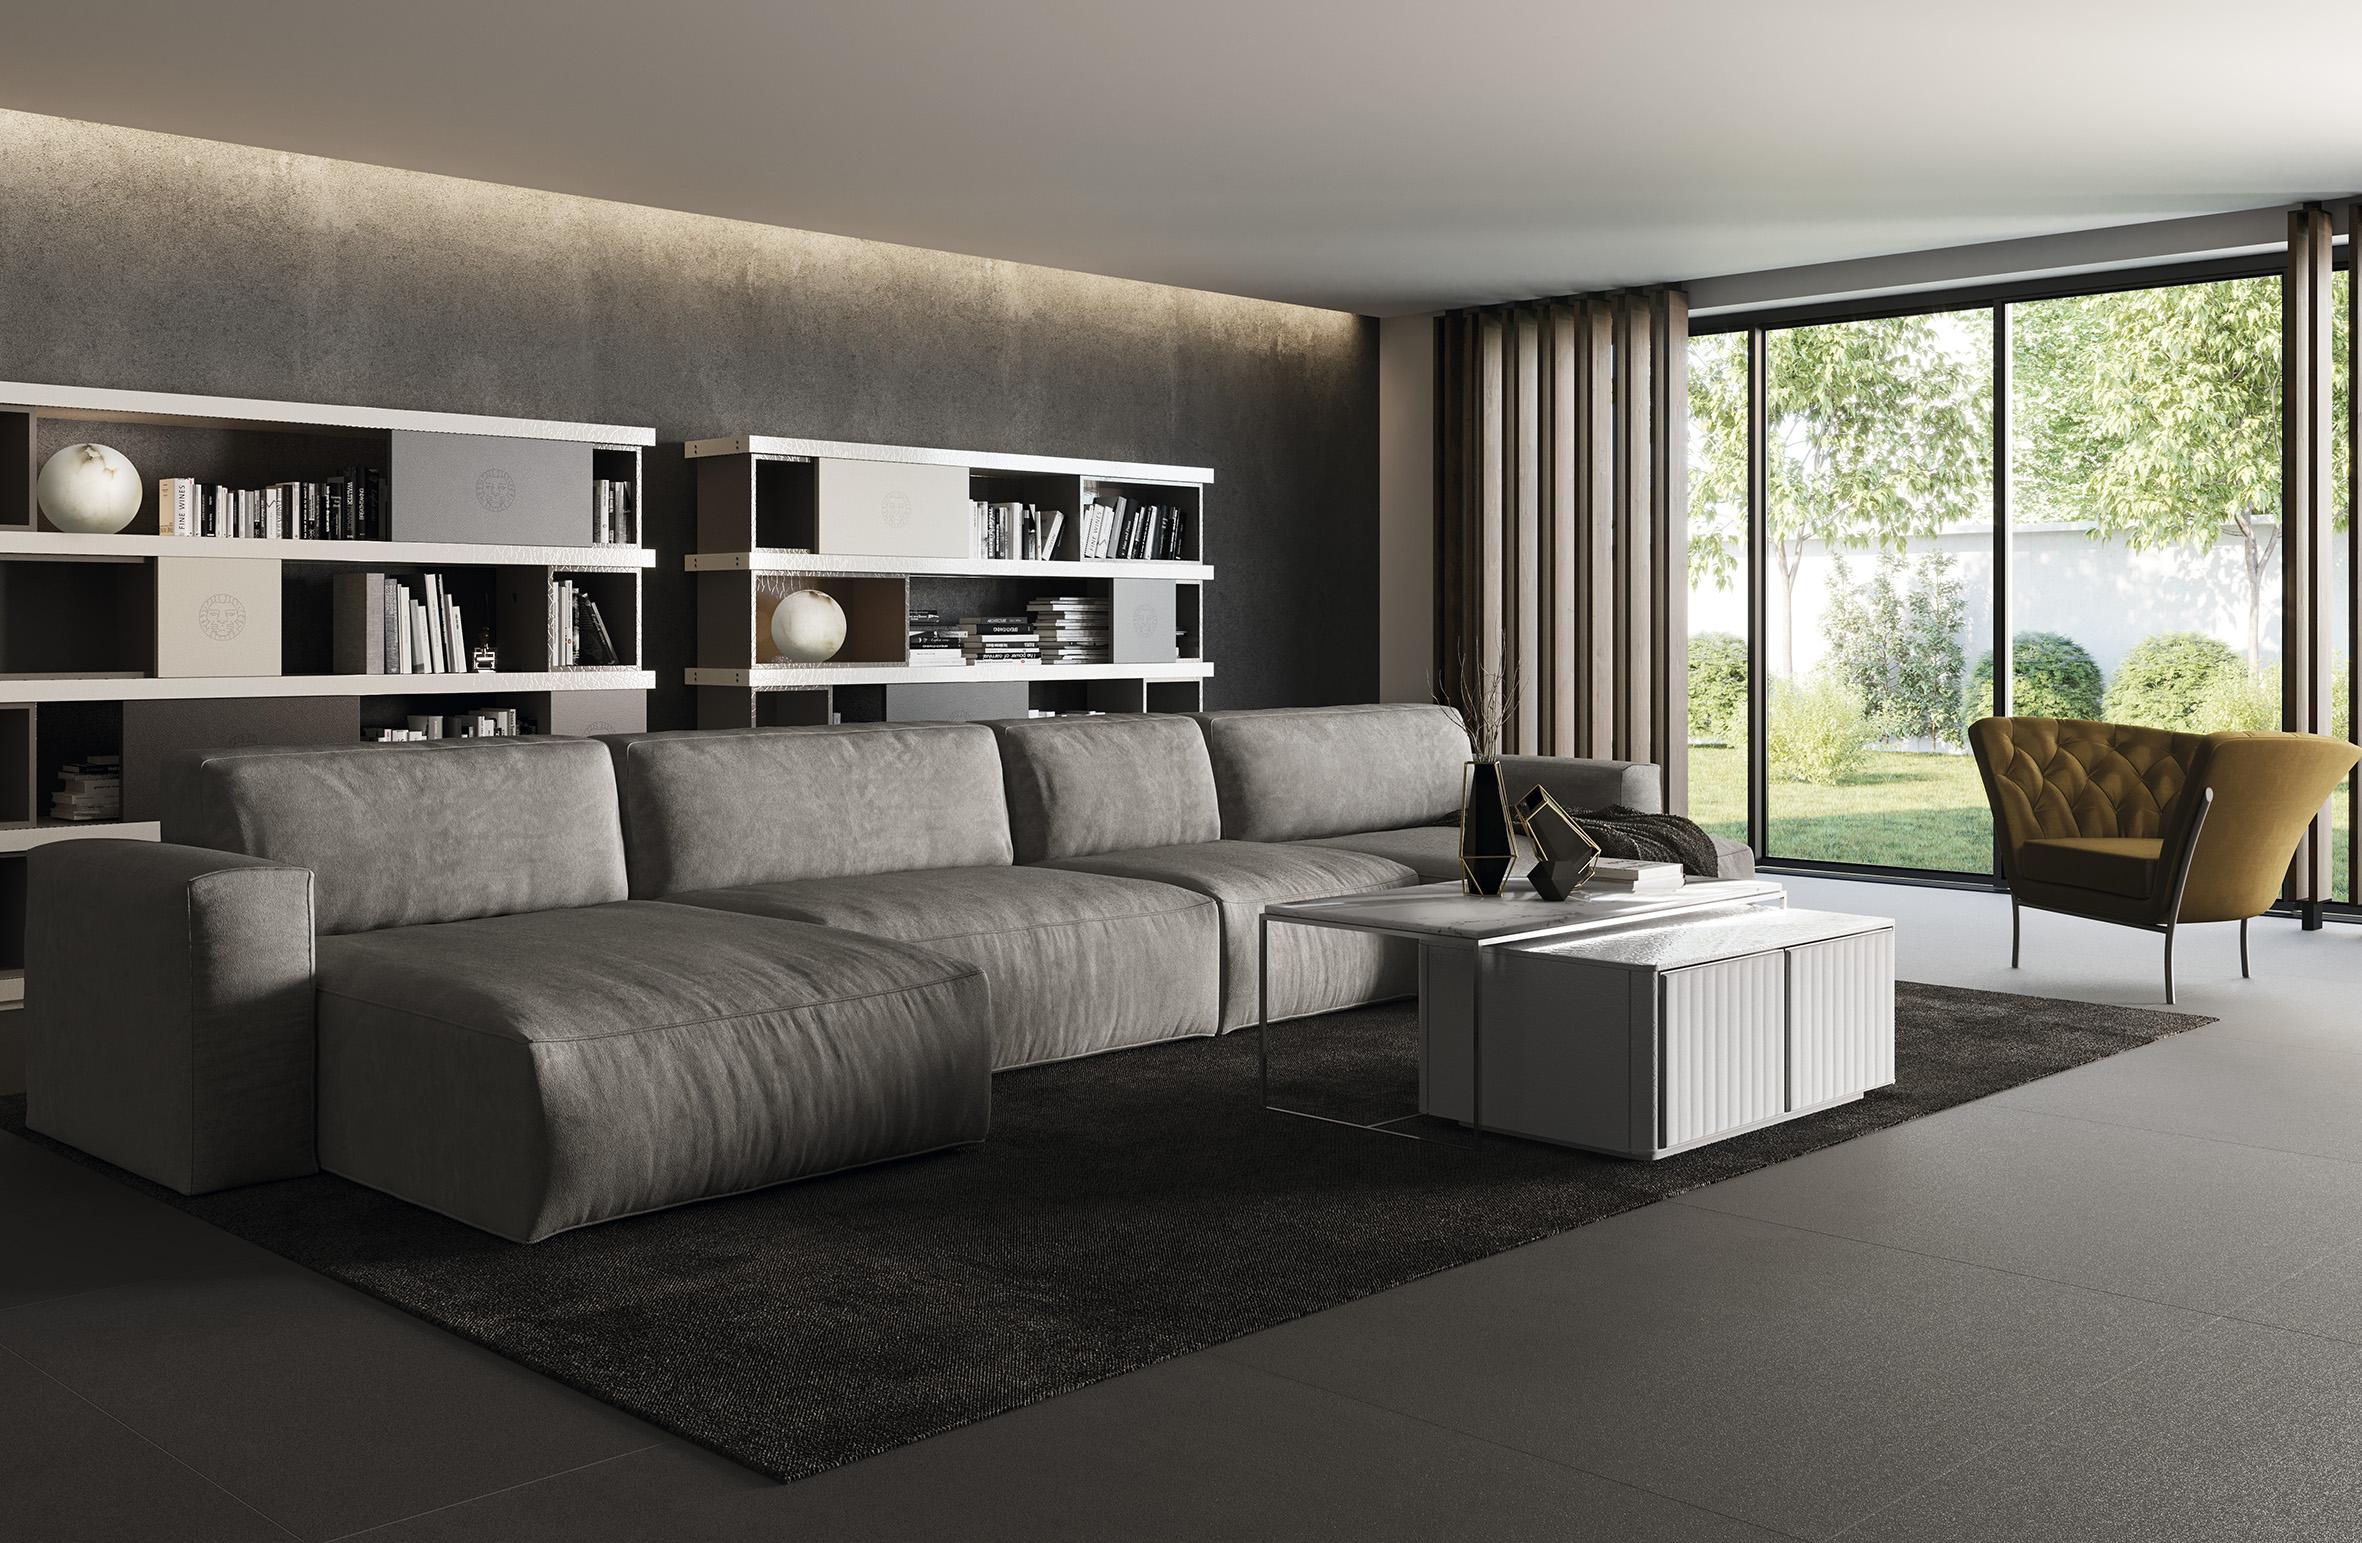 Coleccion Alexandra Uk Luxury Furniture New Luxury Sitting Room